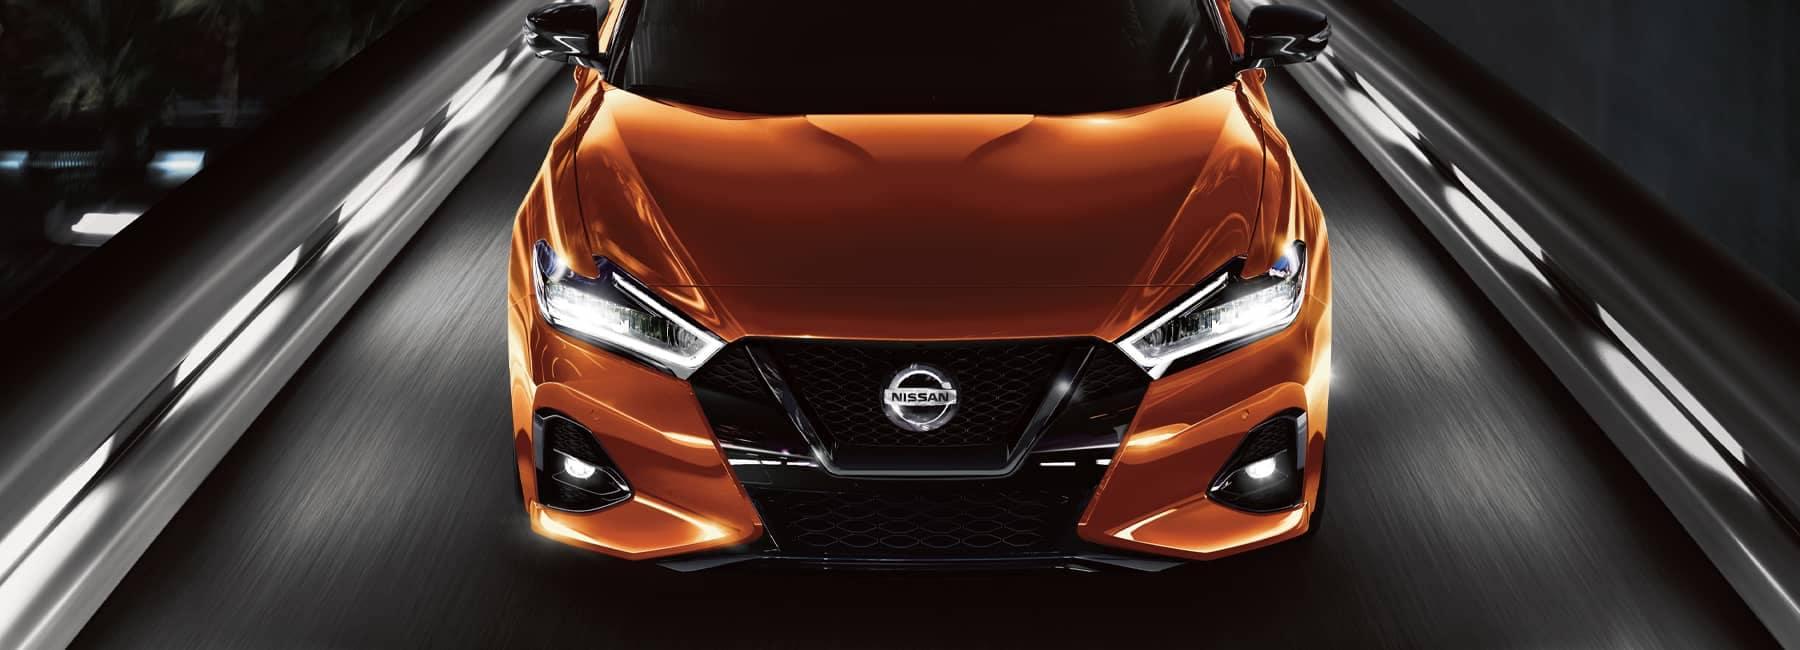 Front angle shot of a 2021 orange Nissan Maxima at night